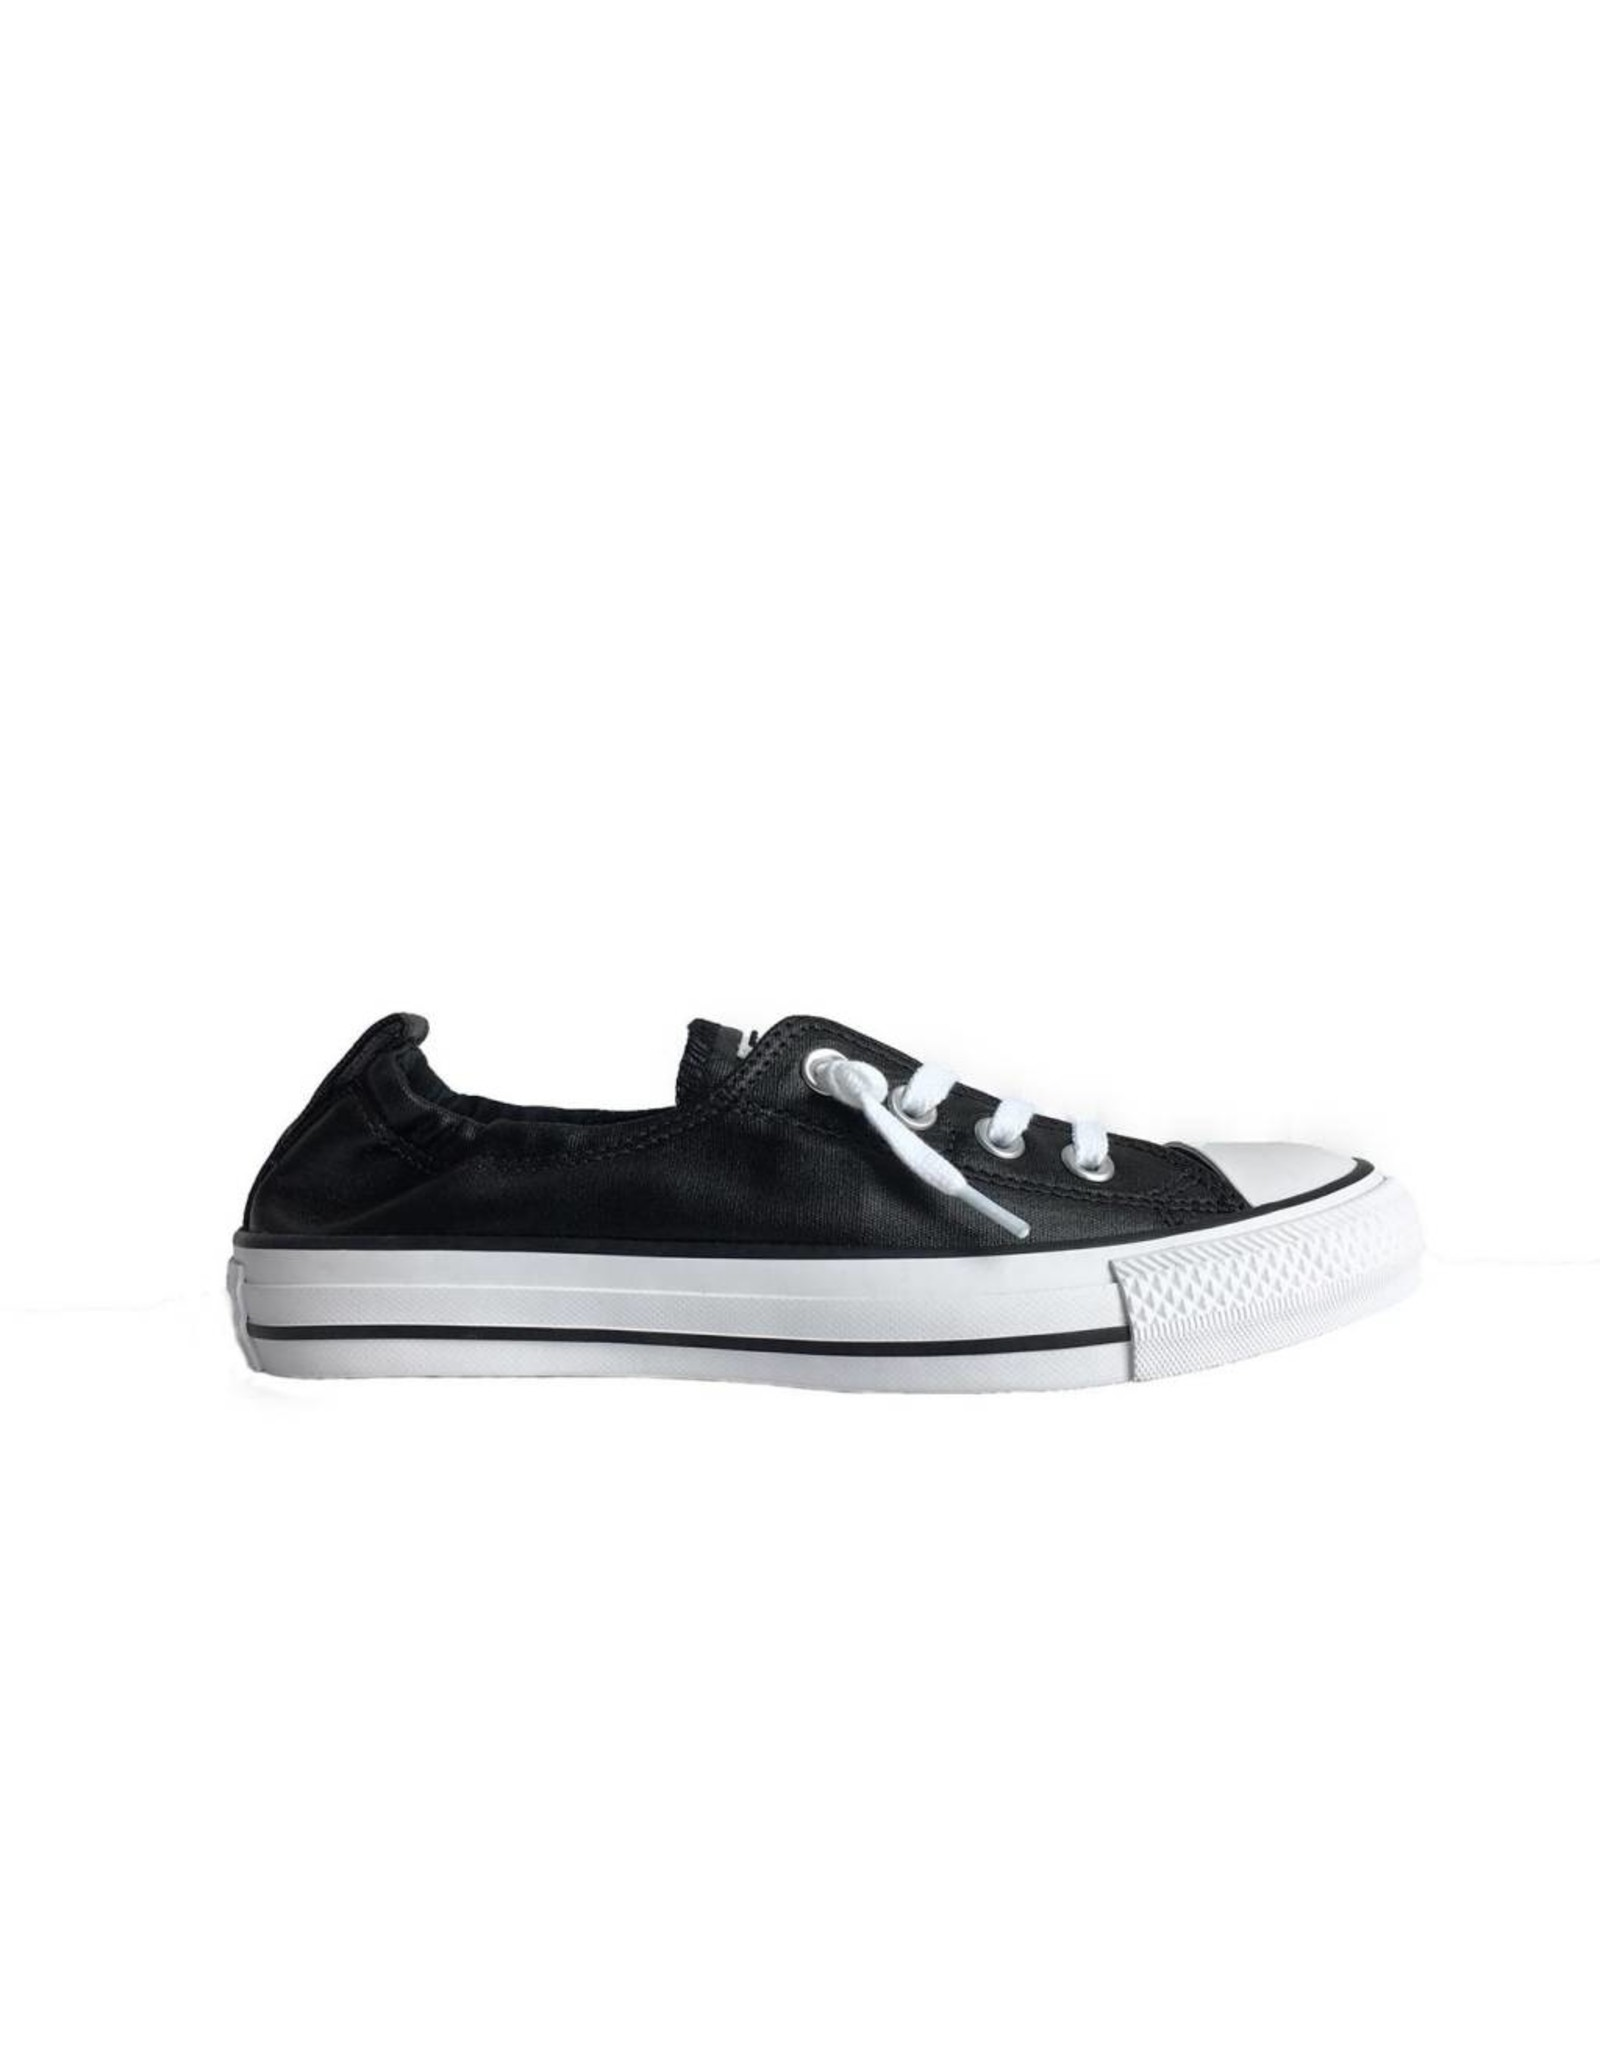 CONVERSE CHUCK TAYLOR SHORELINE OX BLACK/WHITE/BLACK C11SSB-556688F